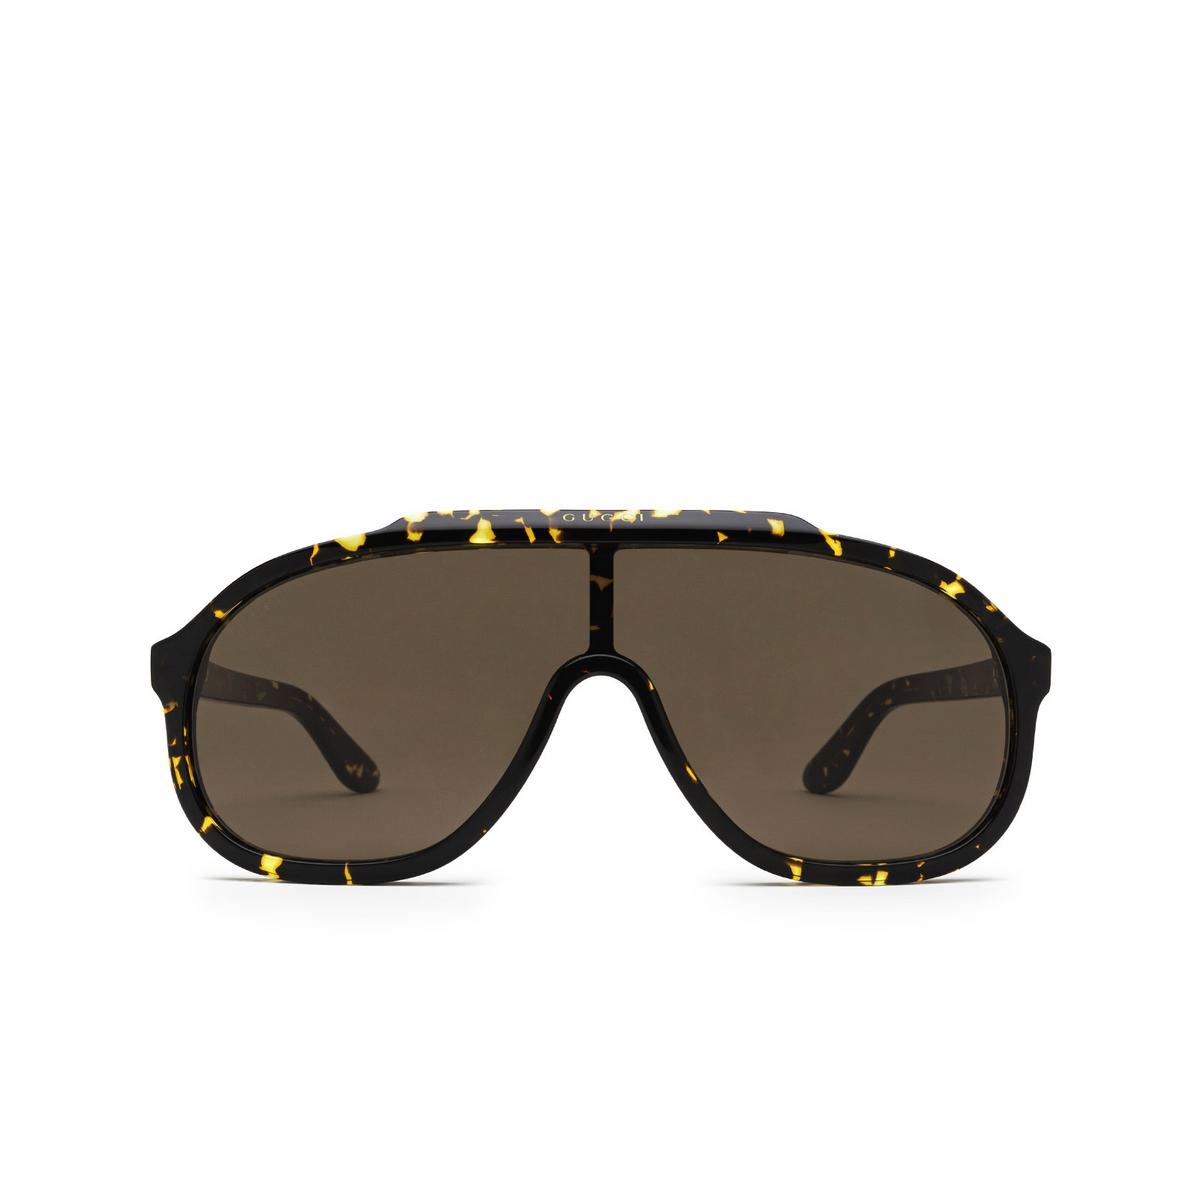 Gucci® Mask Sunglasses: GG1038S color Havana 002 - front view.